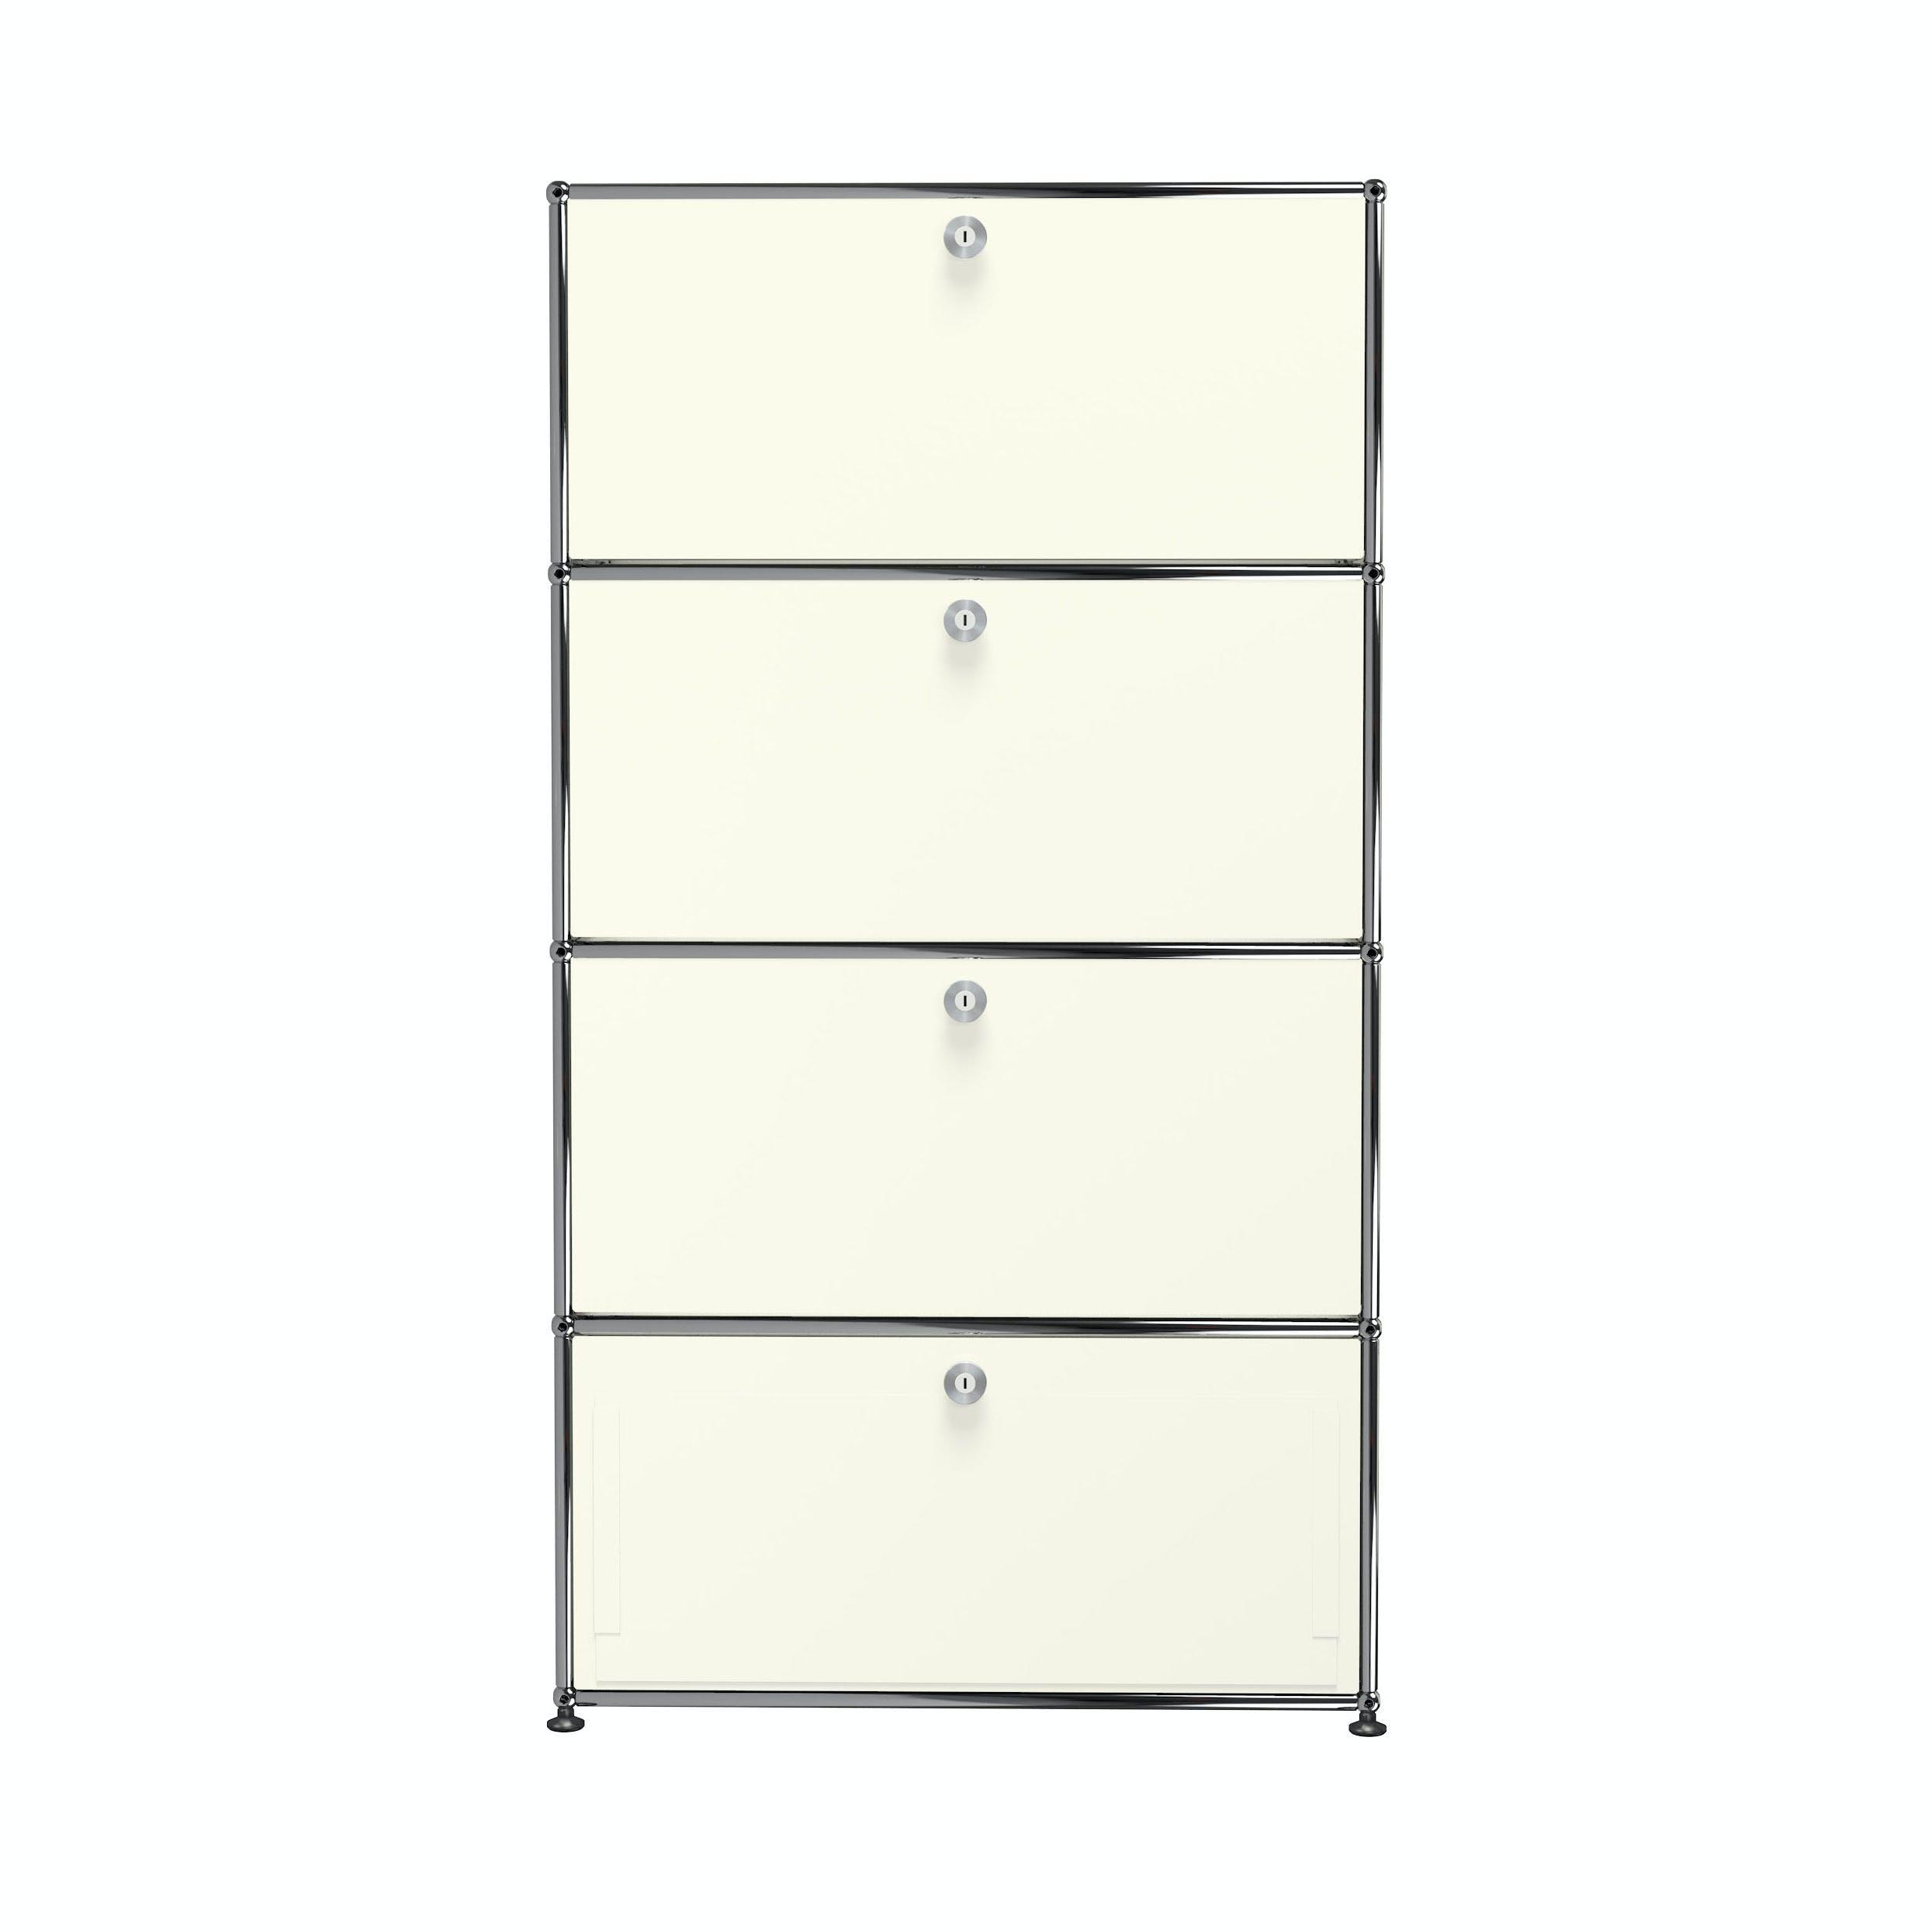 Usm-quick-ship-Haller-Storage-S118A-white-haute-living